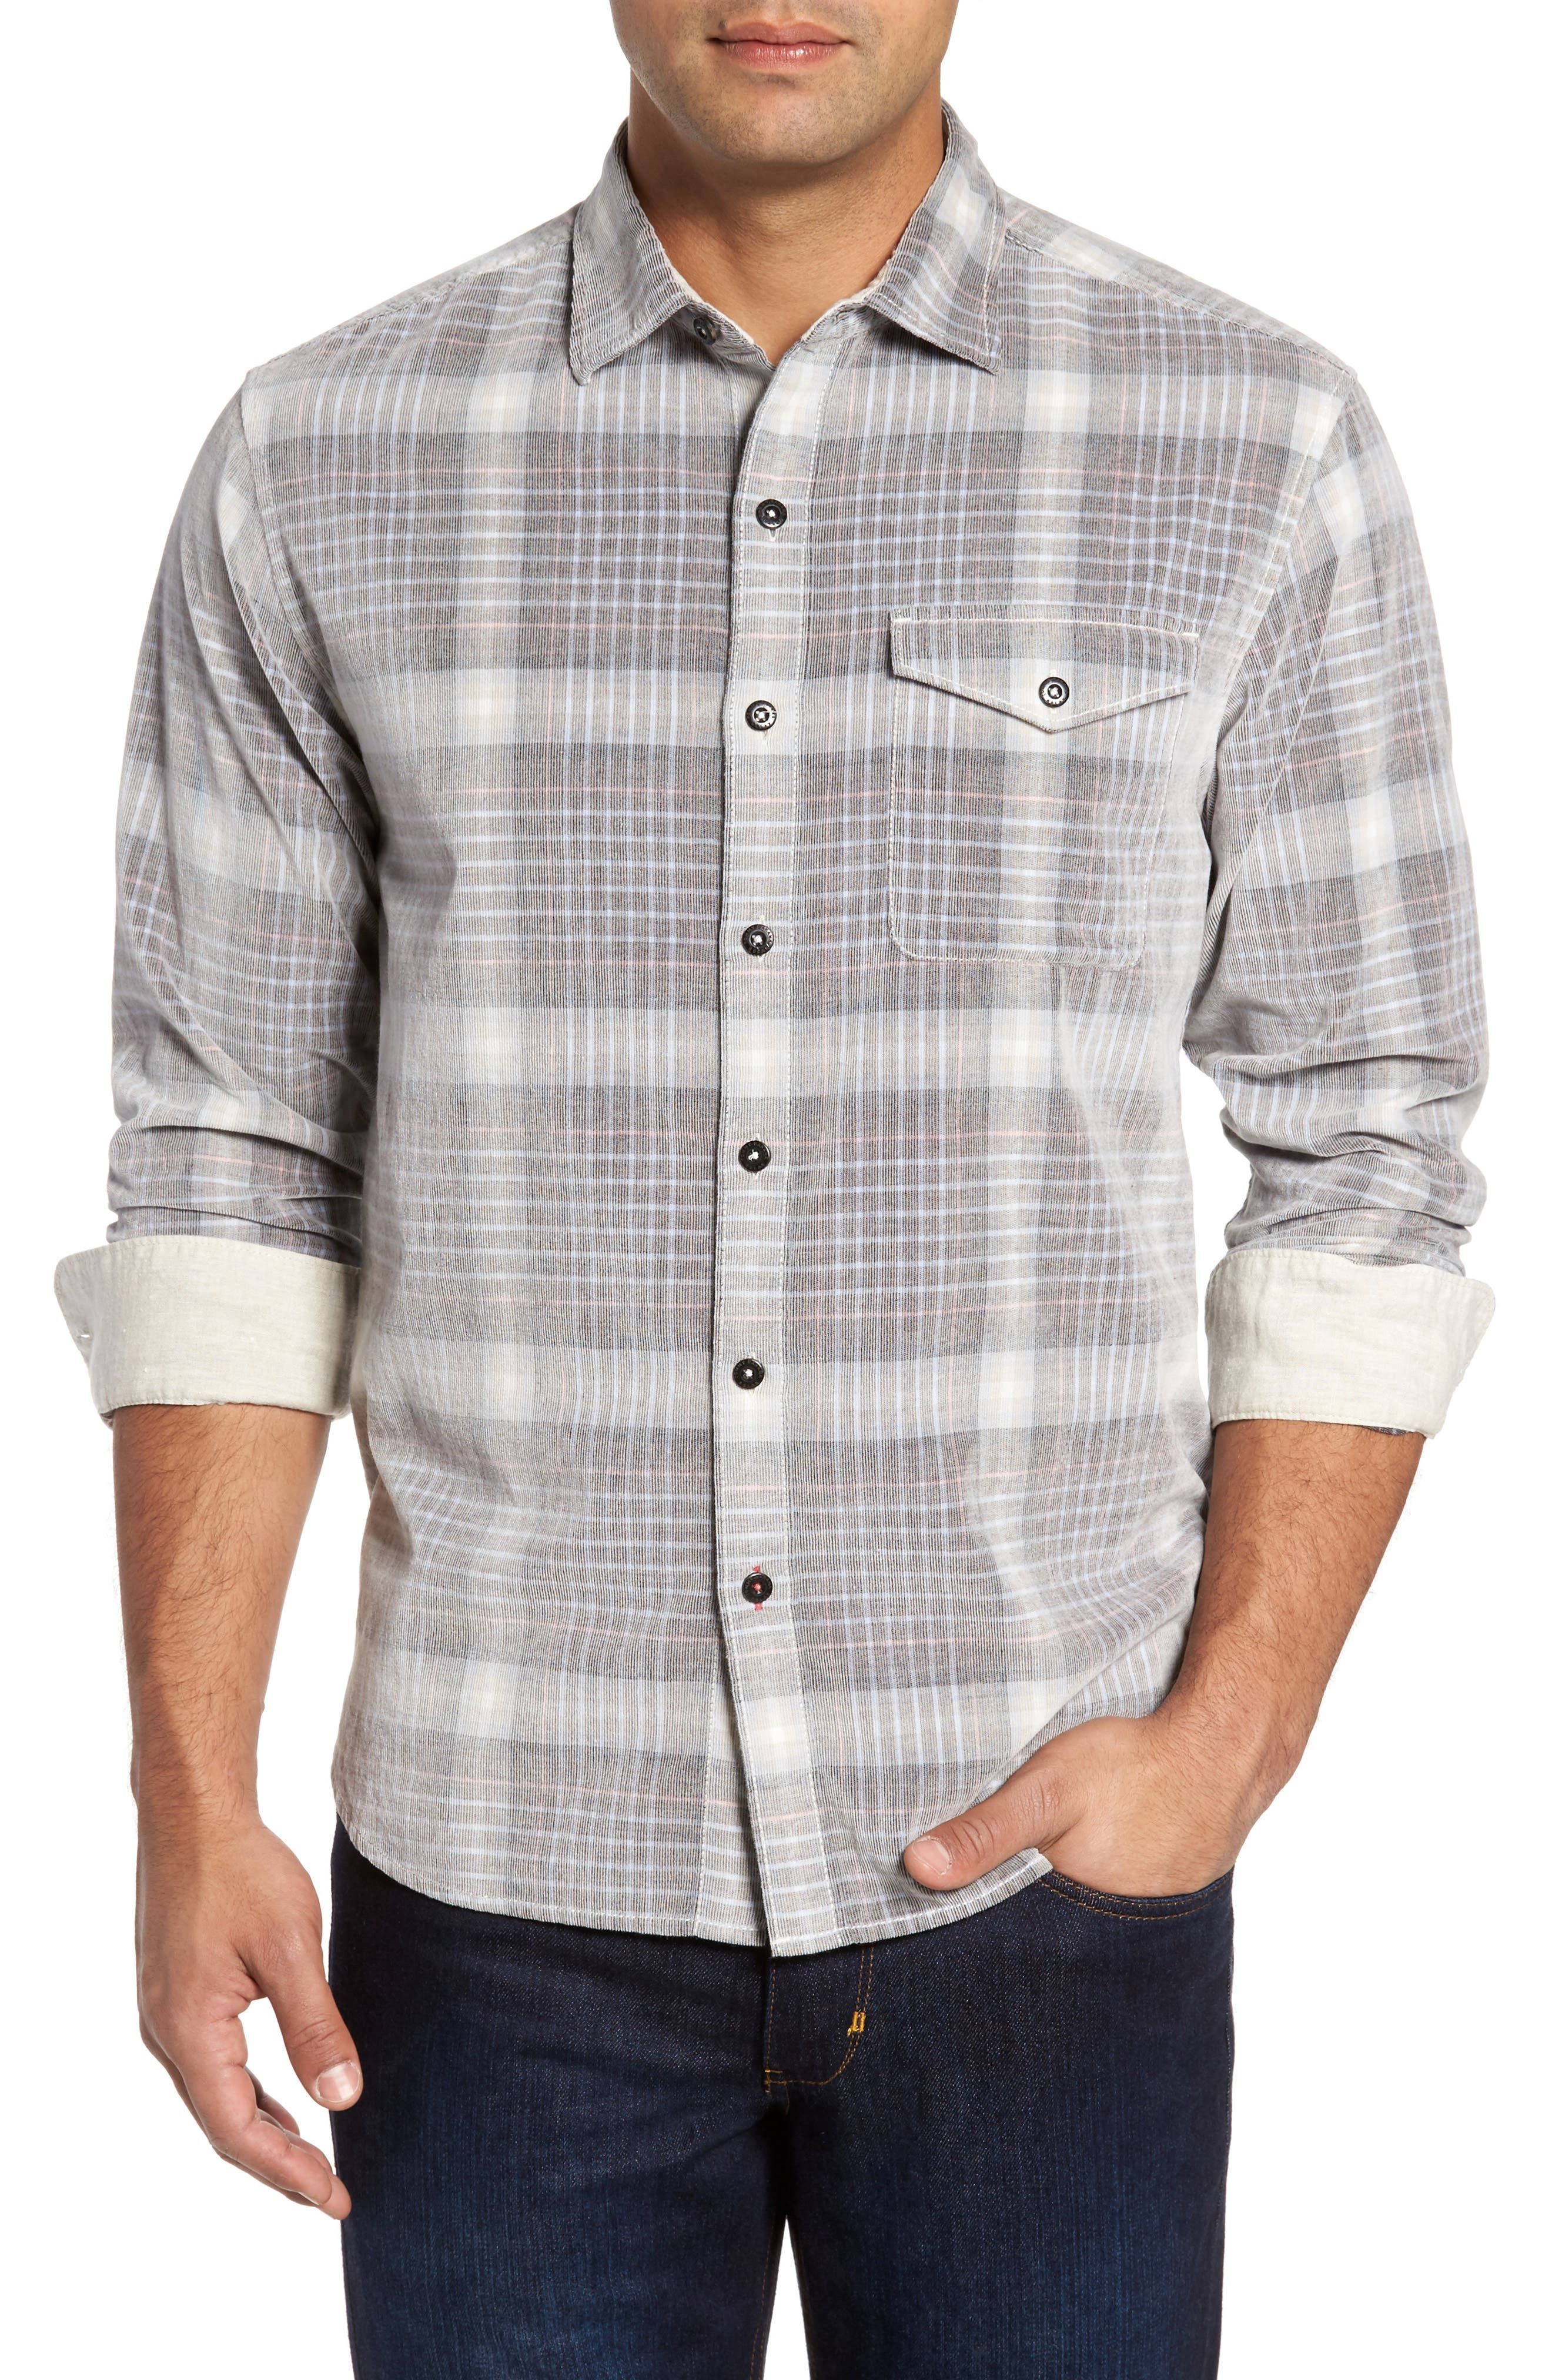 Main Image - Tommy Bahama Standard Fit Plaid Sport Shirt